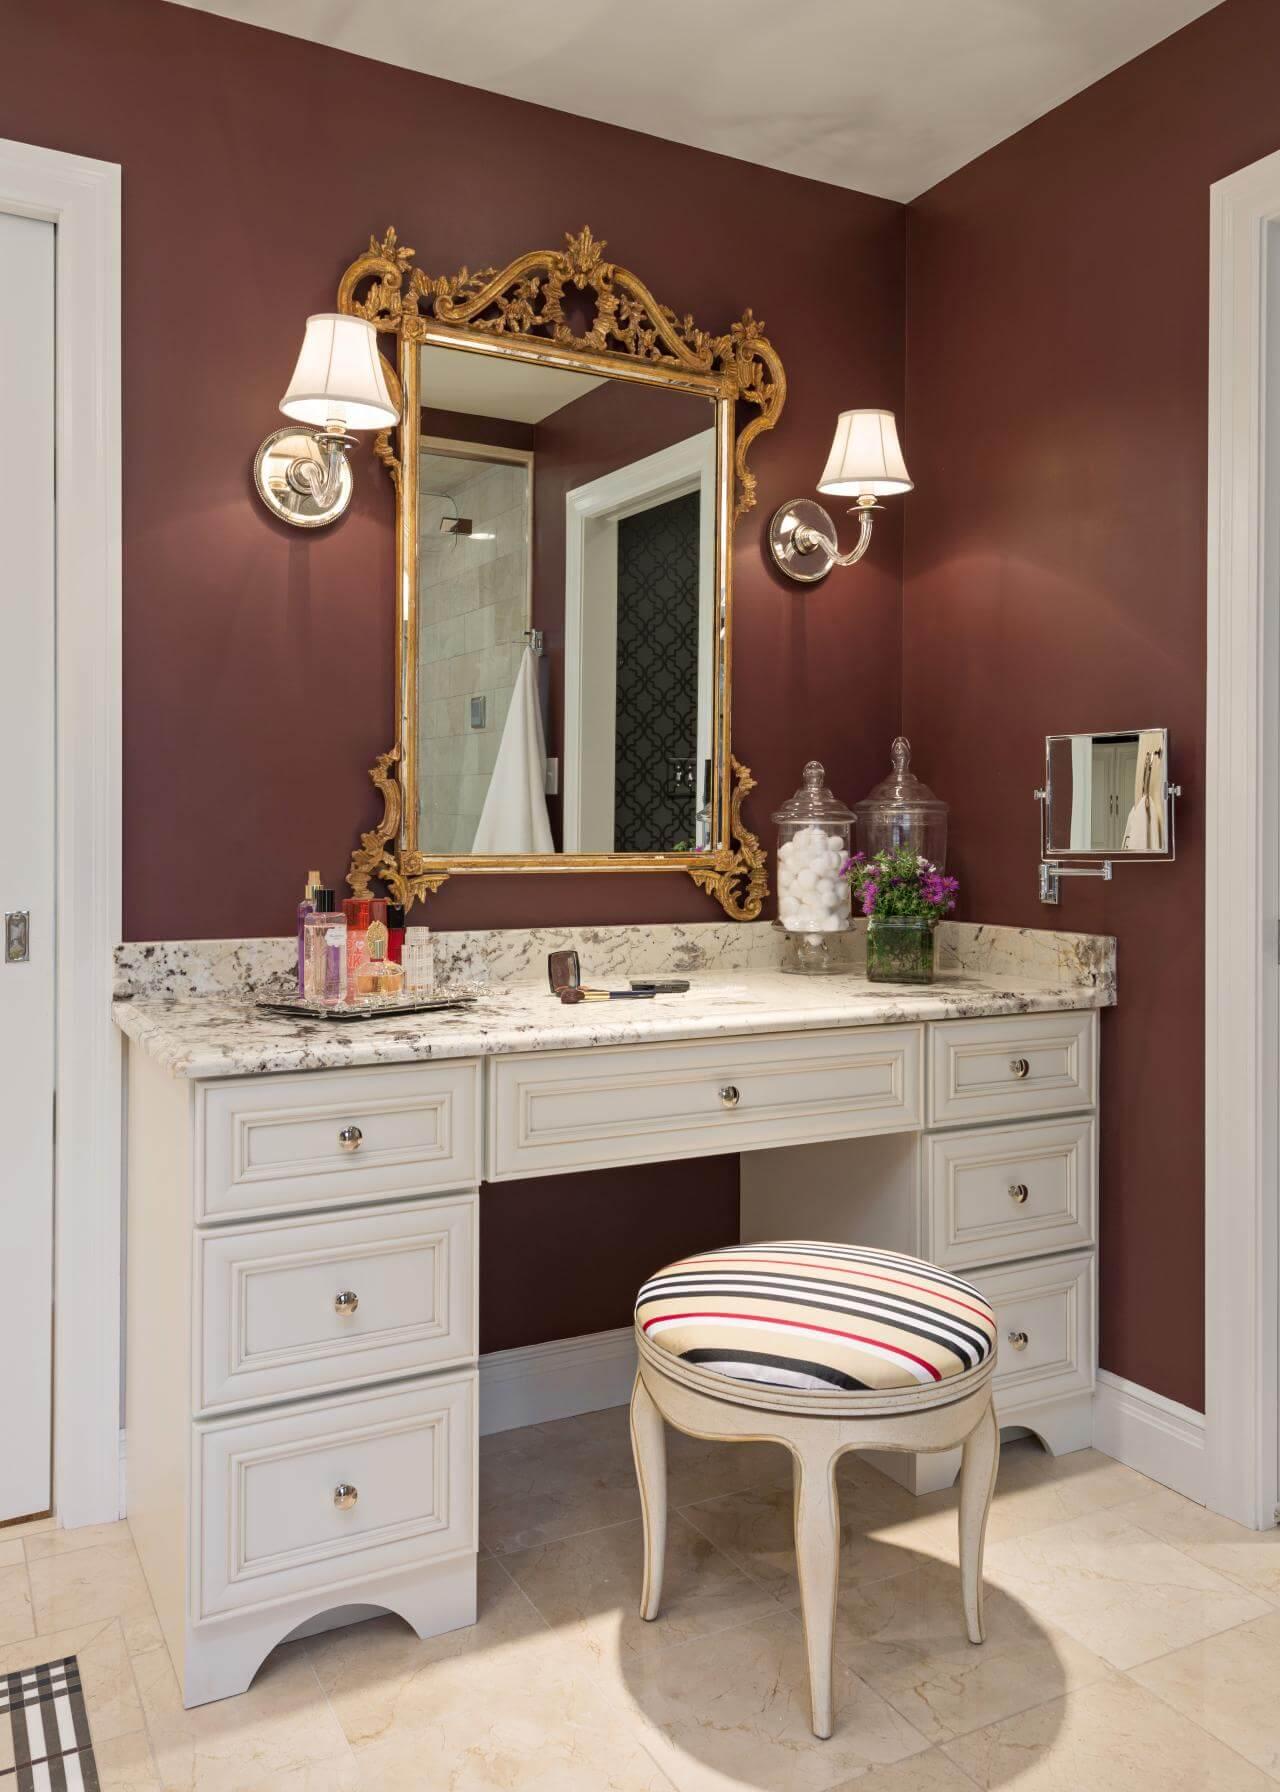 15 Stunning Makeup Vanity Decor Ideas - Style Motivation on Makeup Room Ideas  id=52503